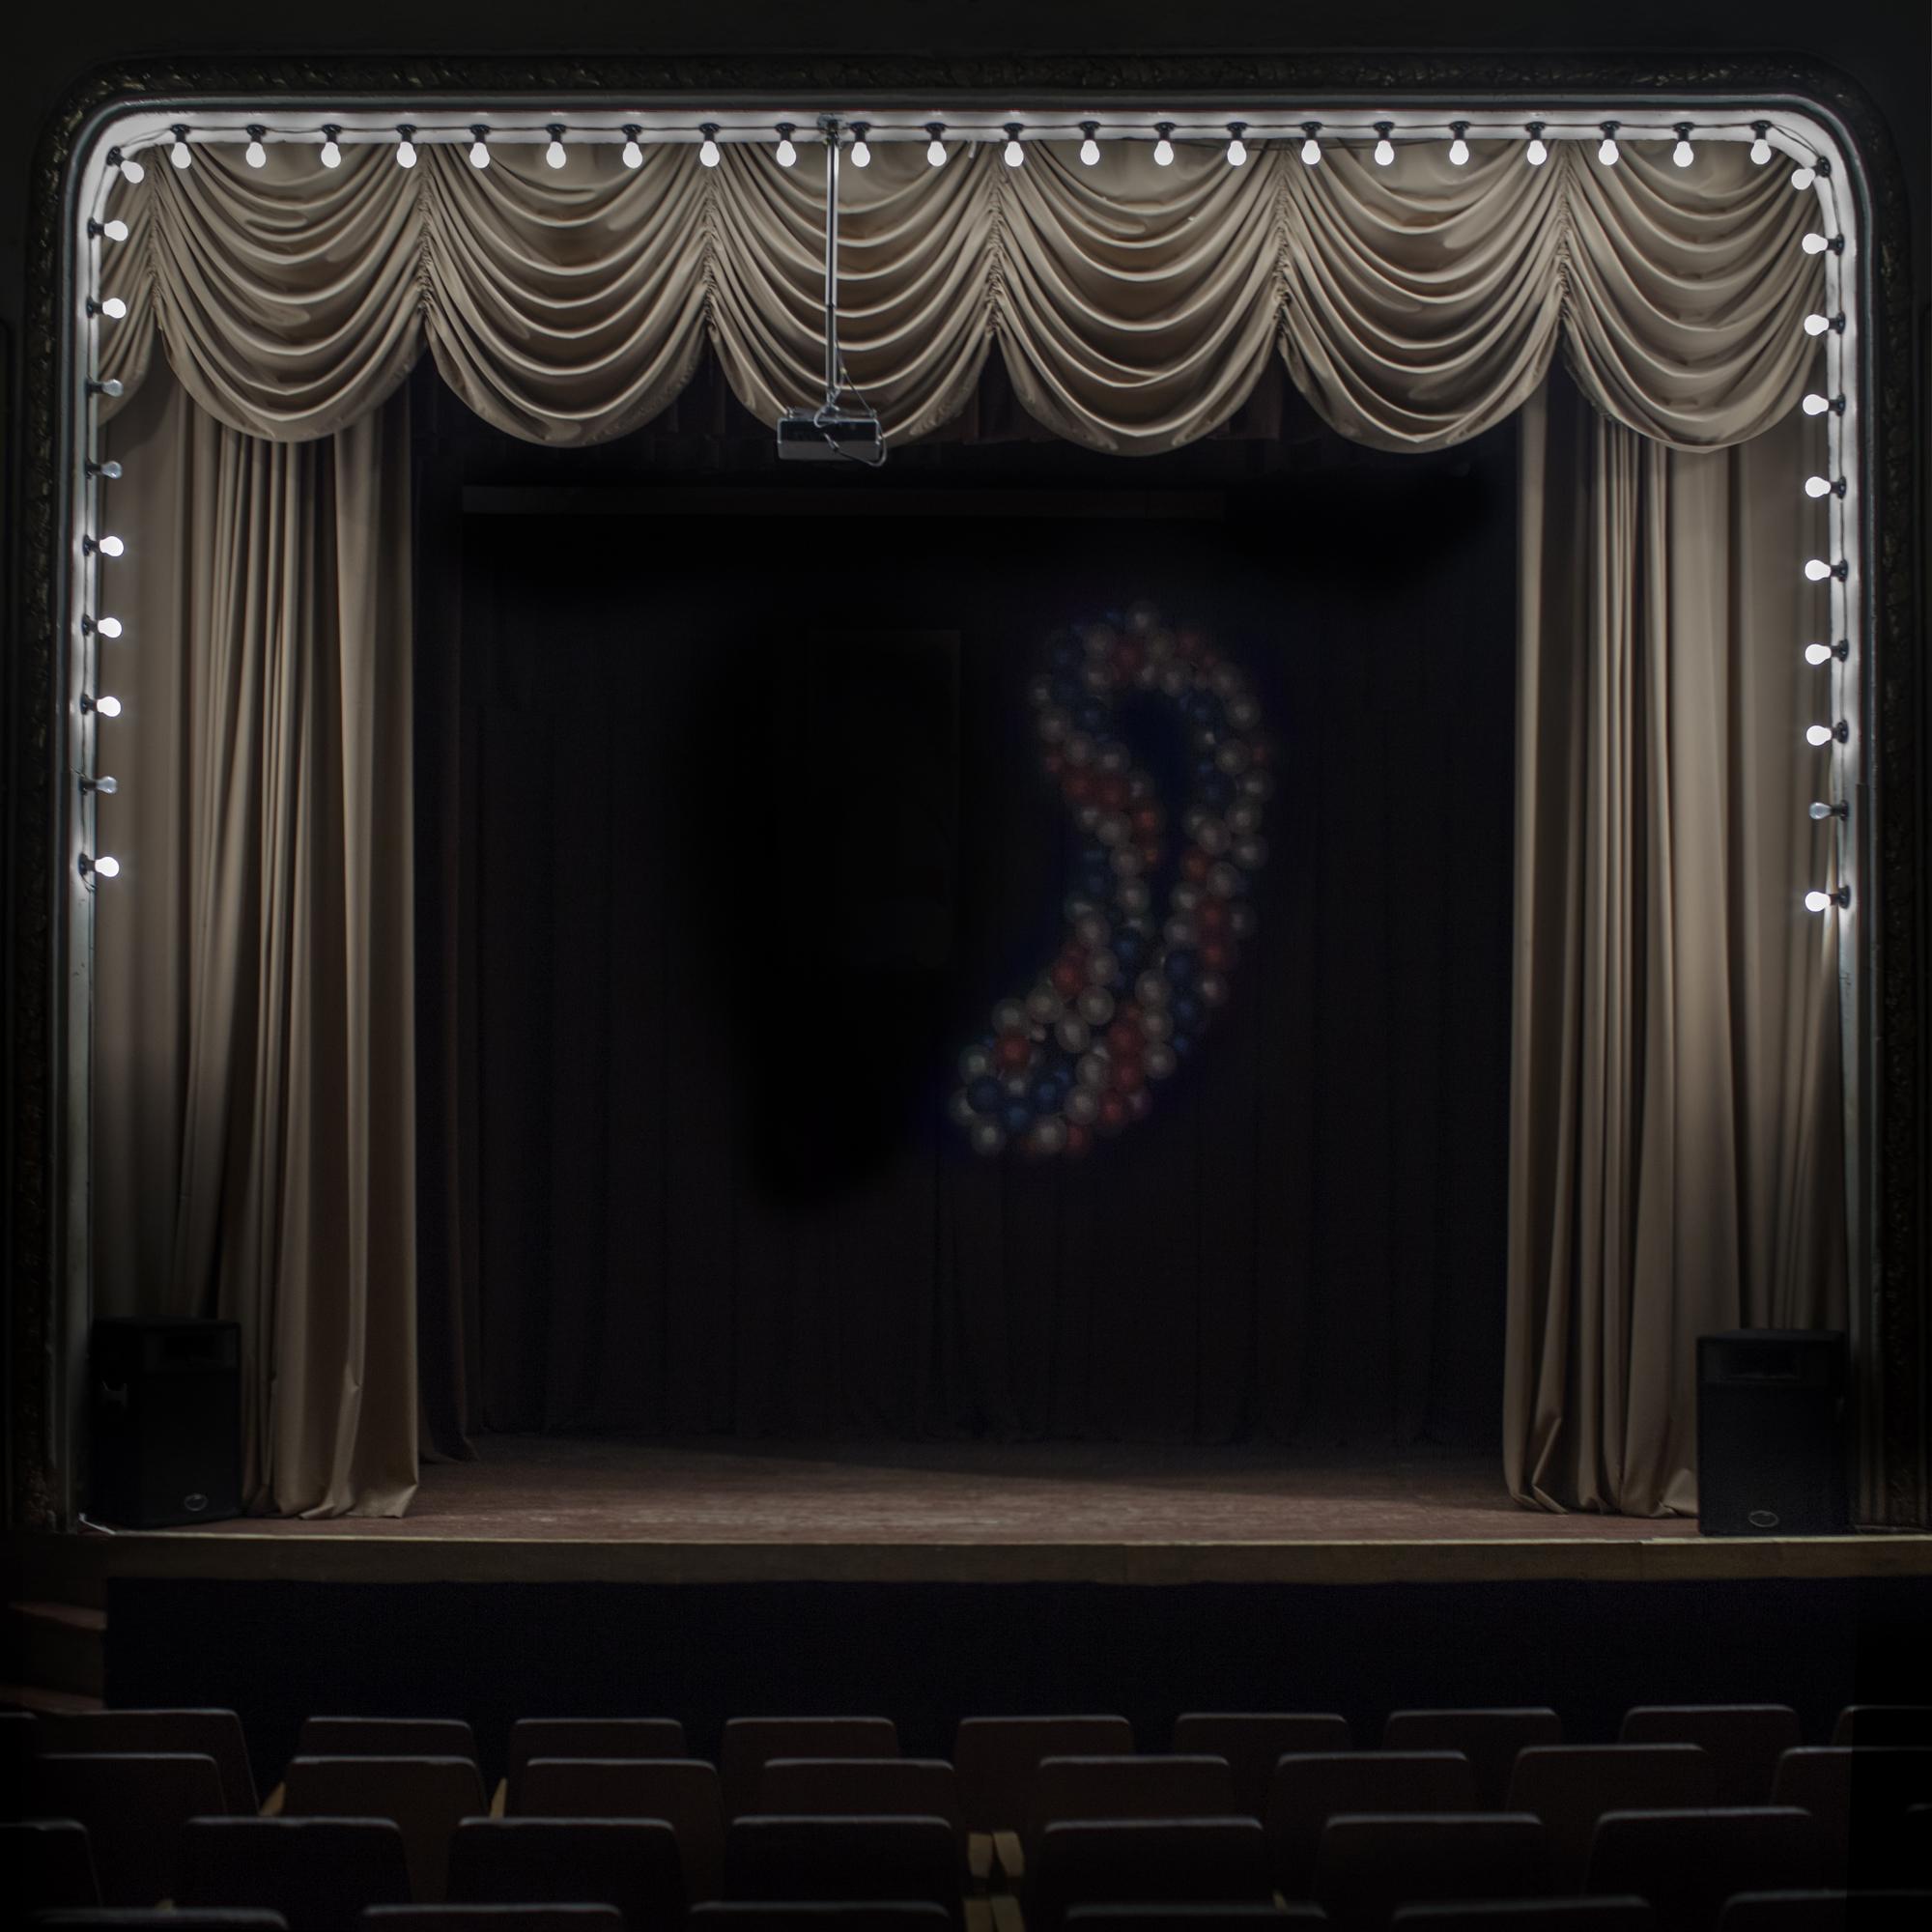 Dark Theater, 2014